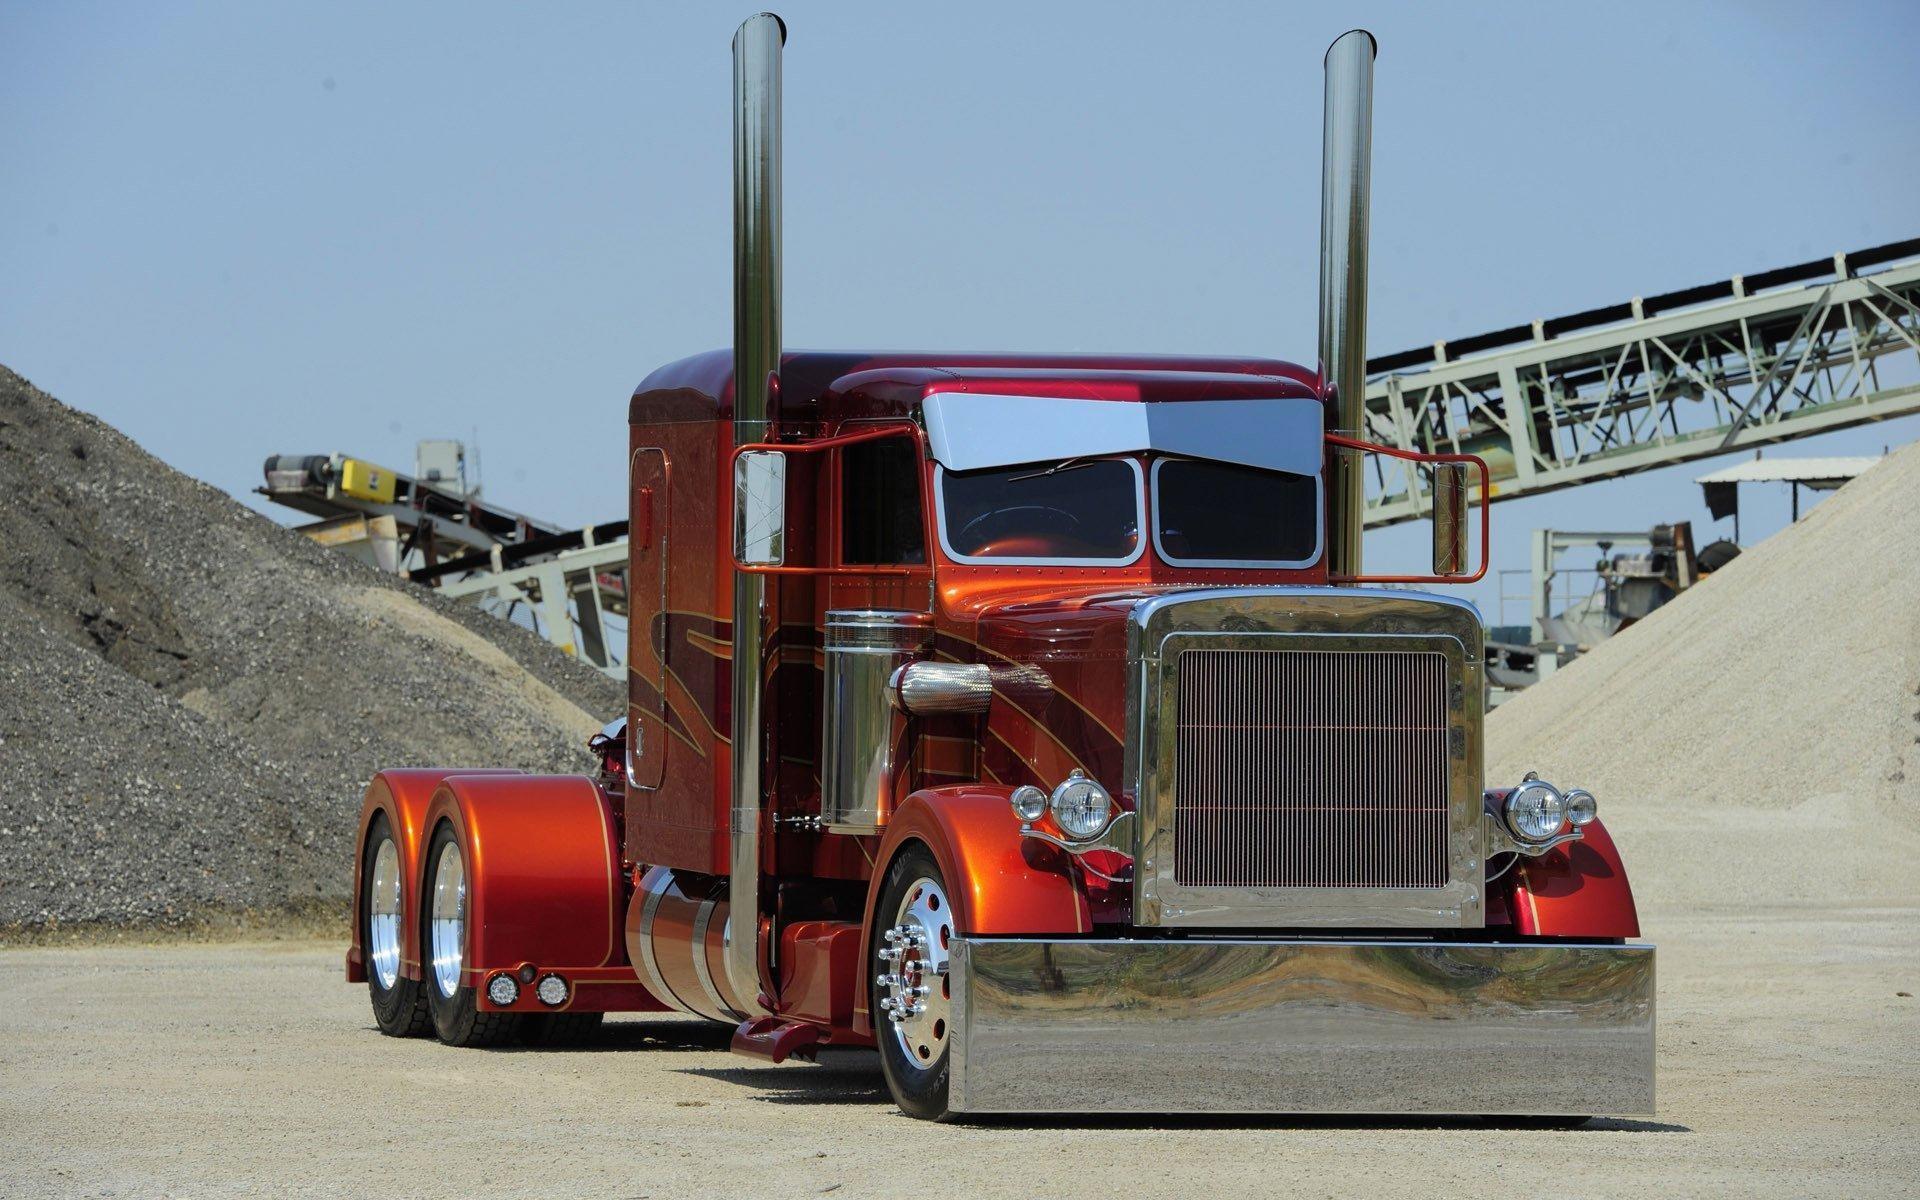 wallpaper.wiki-Semi-Truck-Background-Free-Download-PIC-